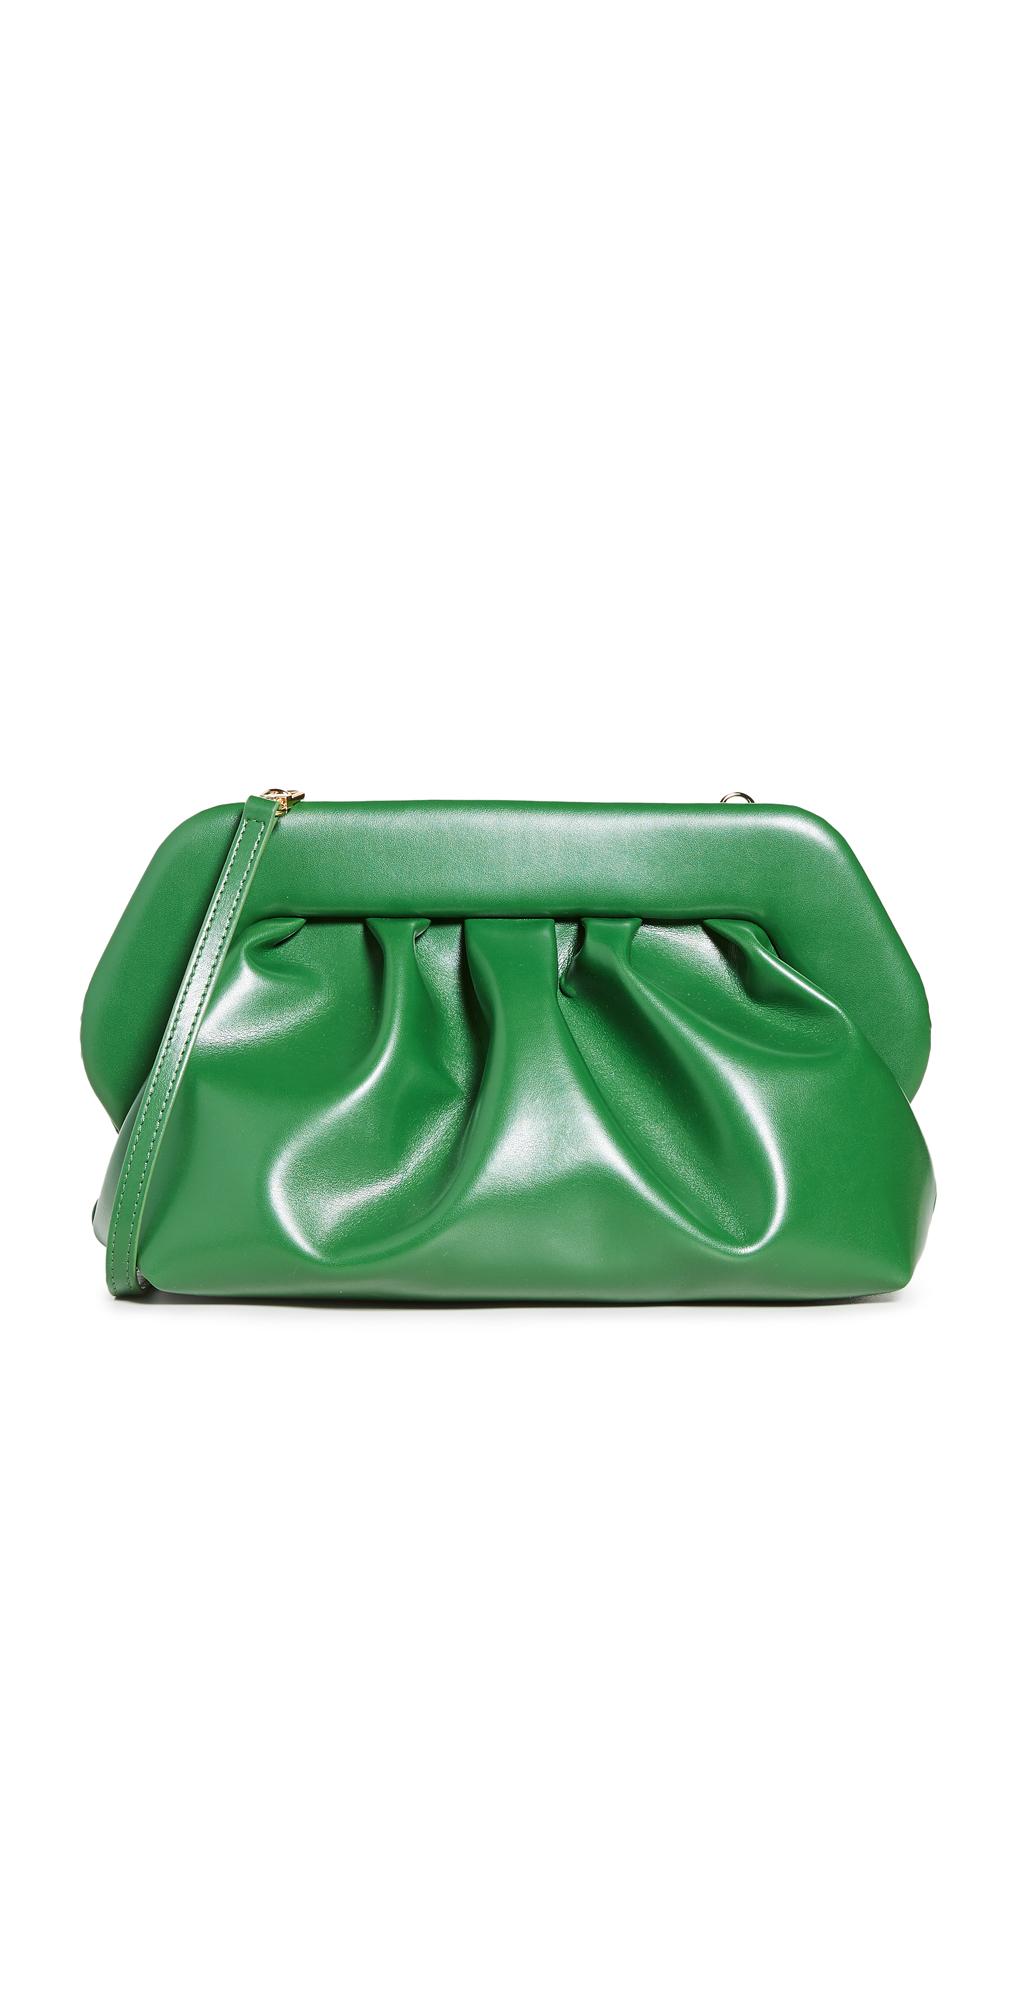 Themoire Bios Bag